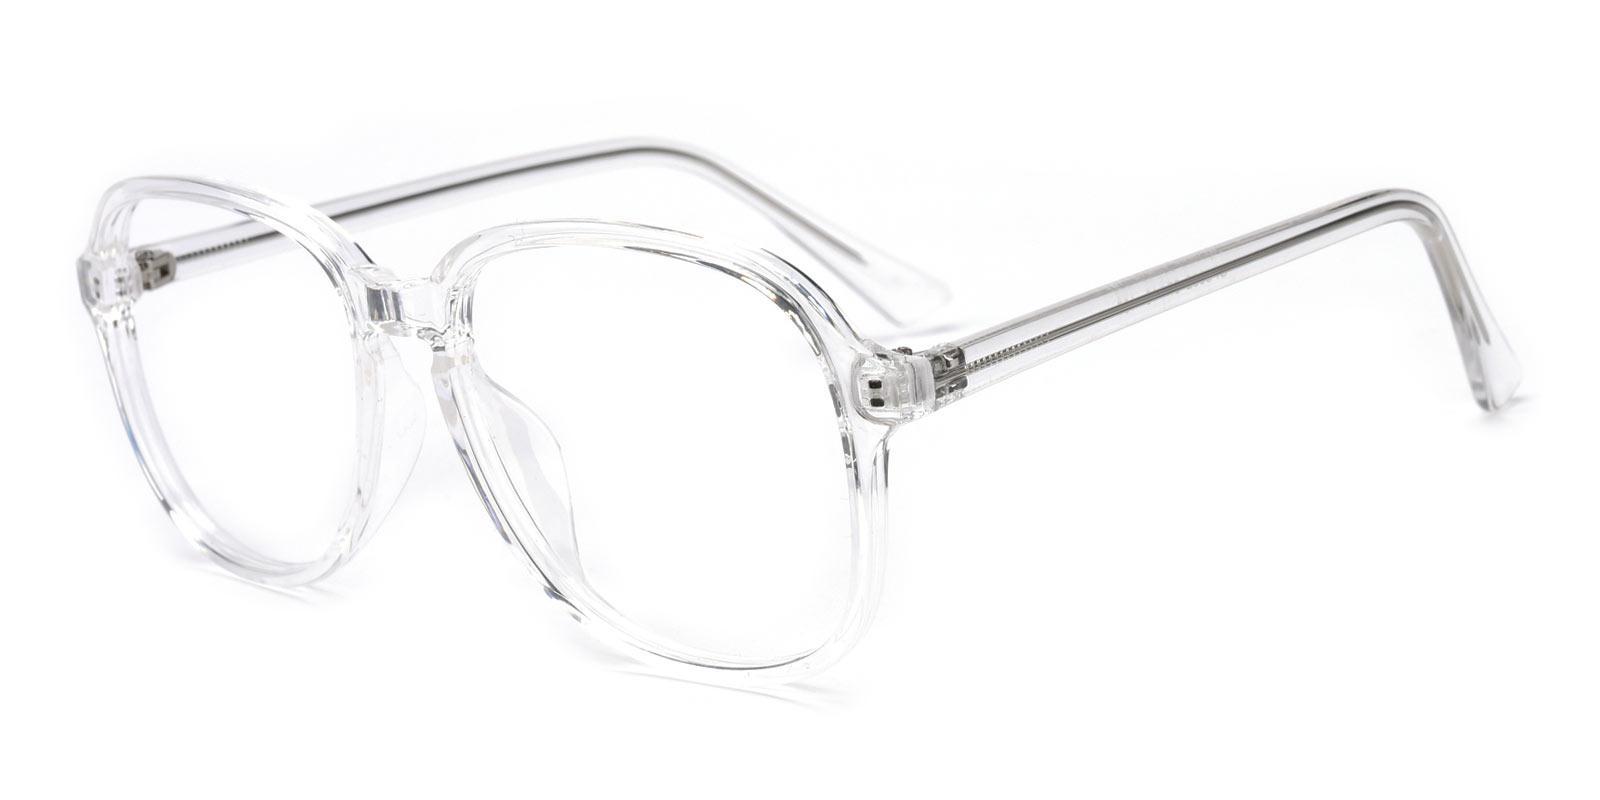 70s-Translucent-Square-TR-Eyeglasses-additional1